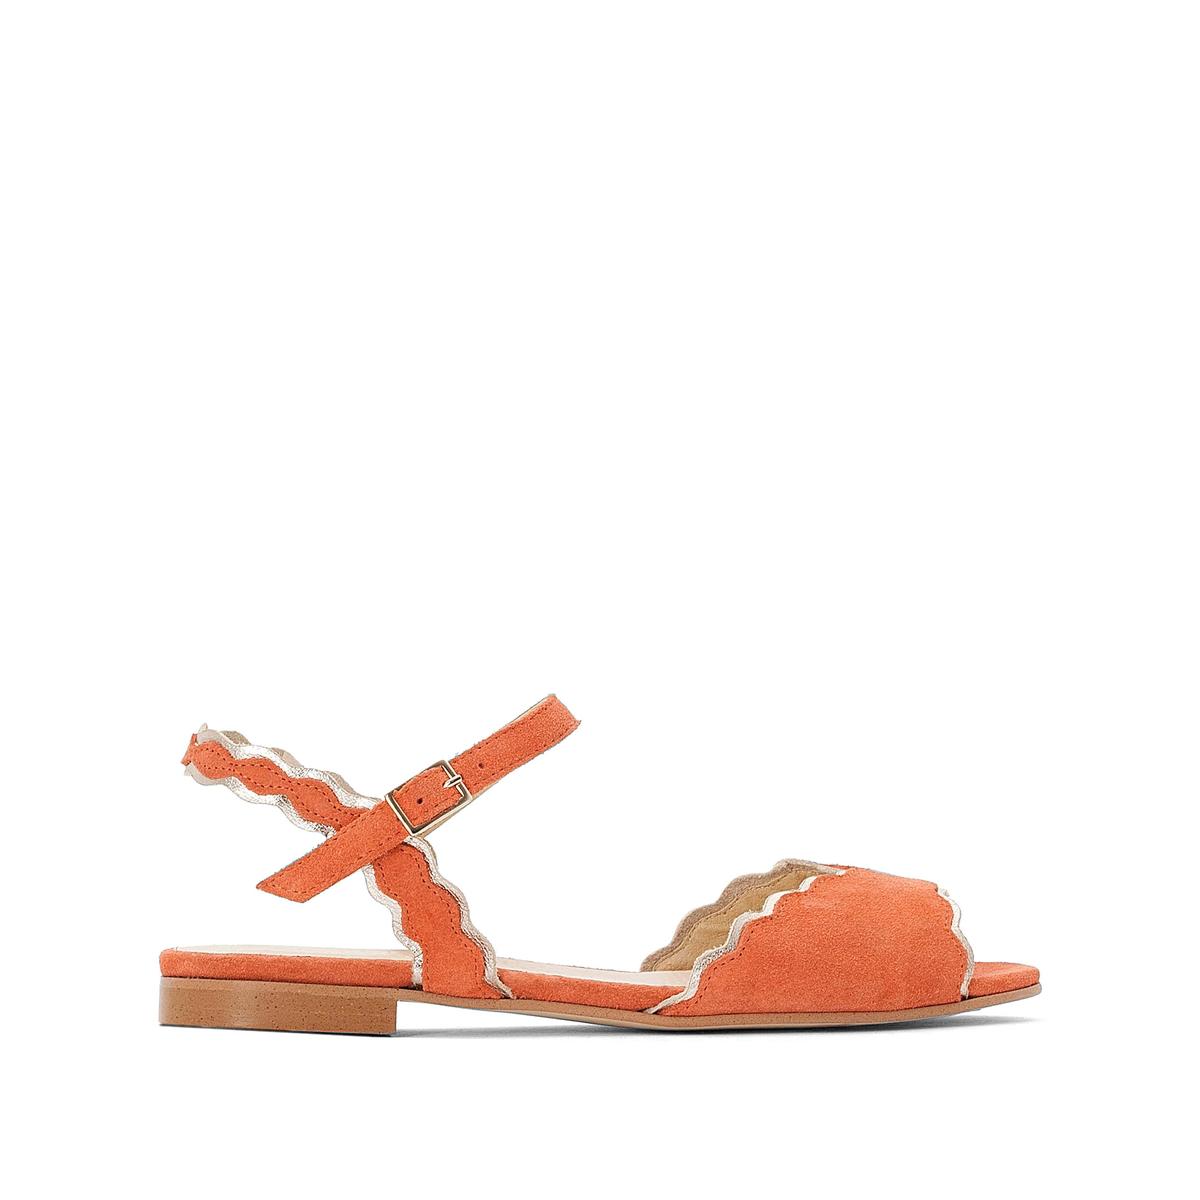 Sandalias de piel con detalles dorados